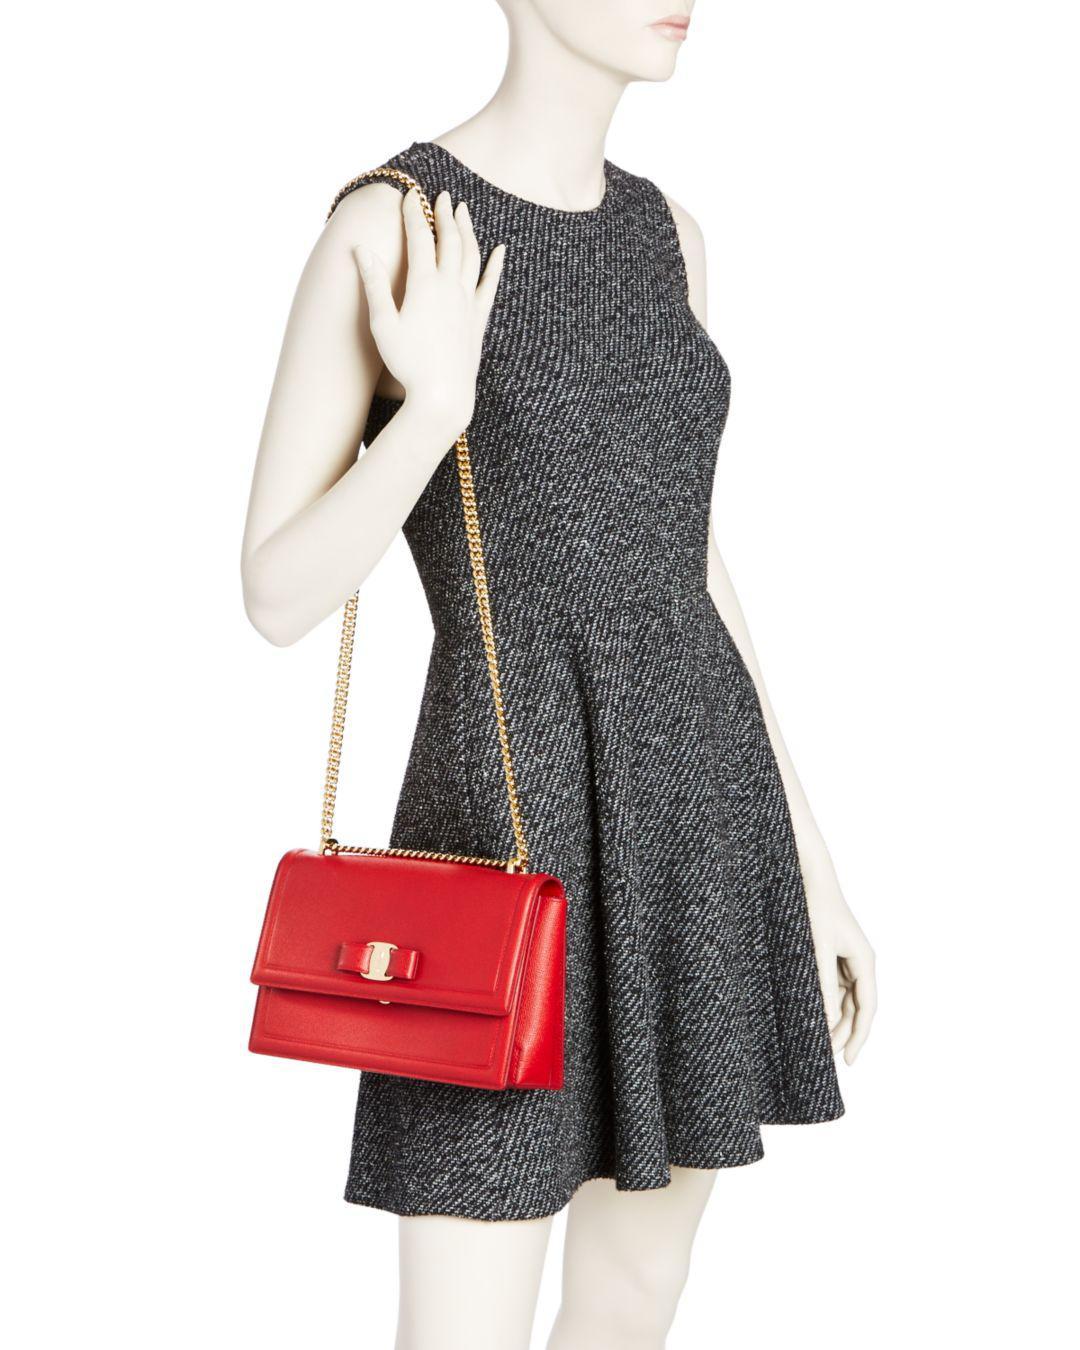 Lyst - Ferragamo Ginny Medium Saffiano Leather Shoulder Bag 99c1e295c473e